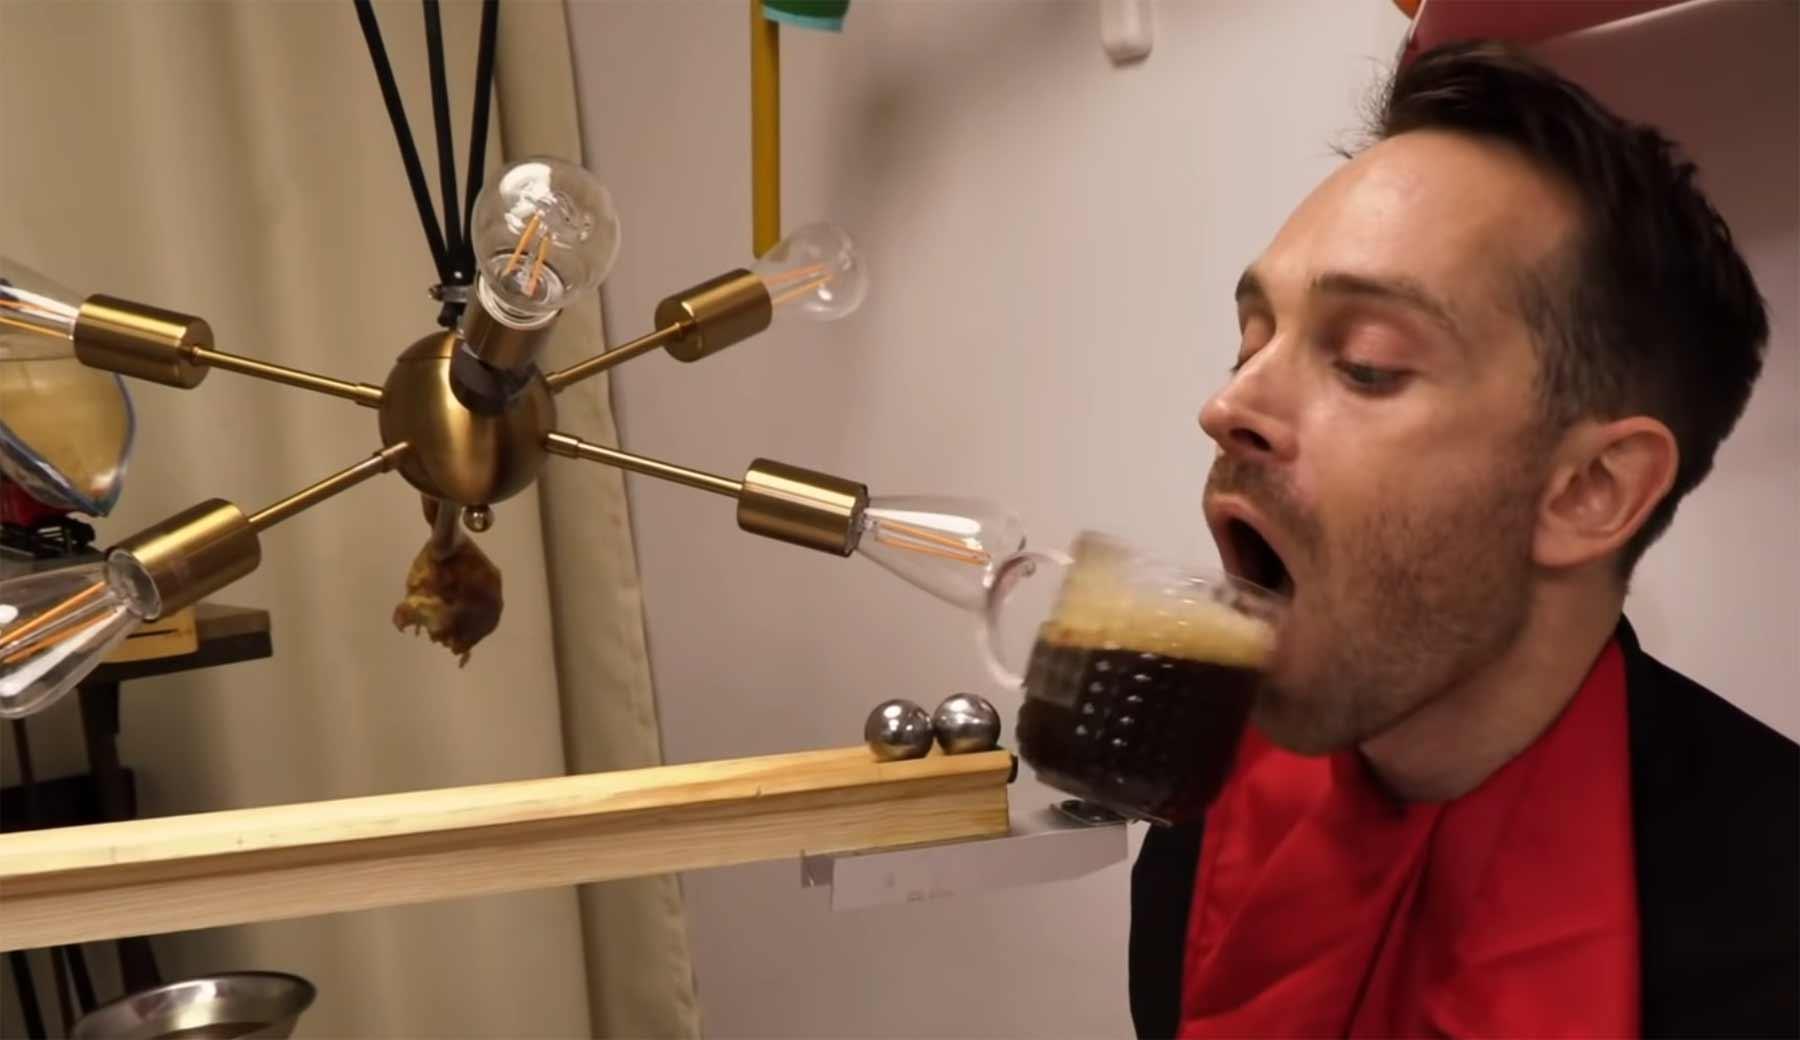 Automatisierte Fütter-Kettenreaktion josephs-dinner-machine